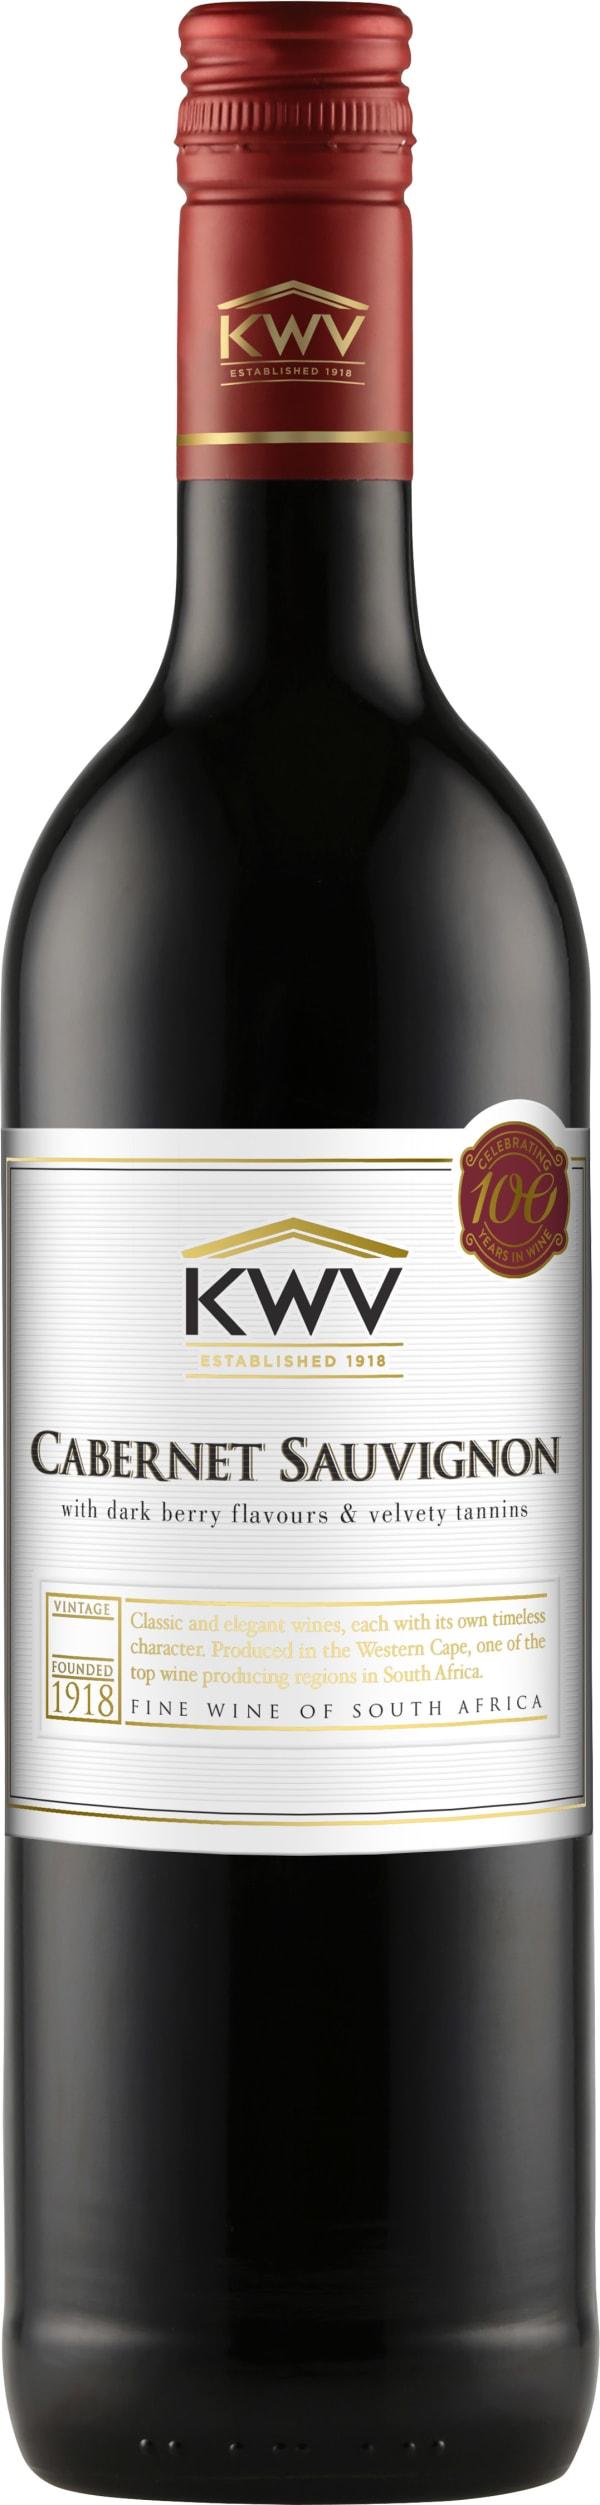 KWV Classic Collection Cabernet Sauvignon 2017